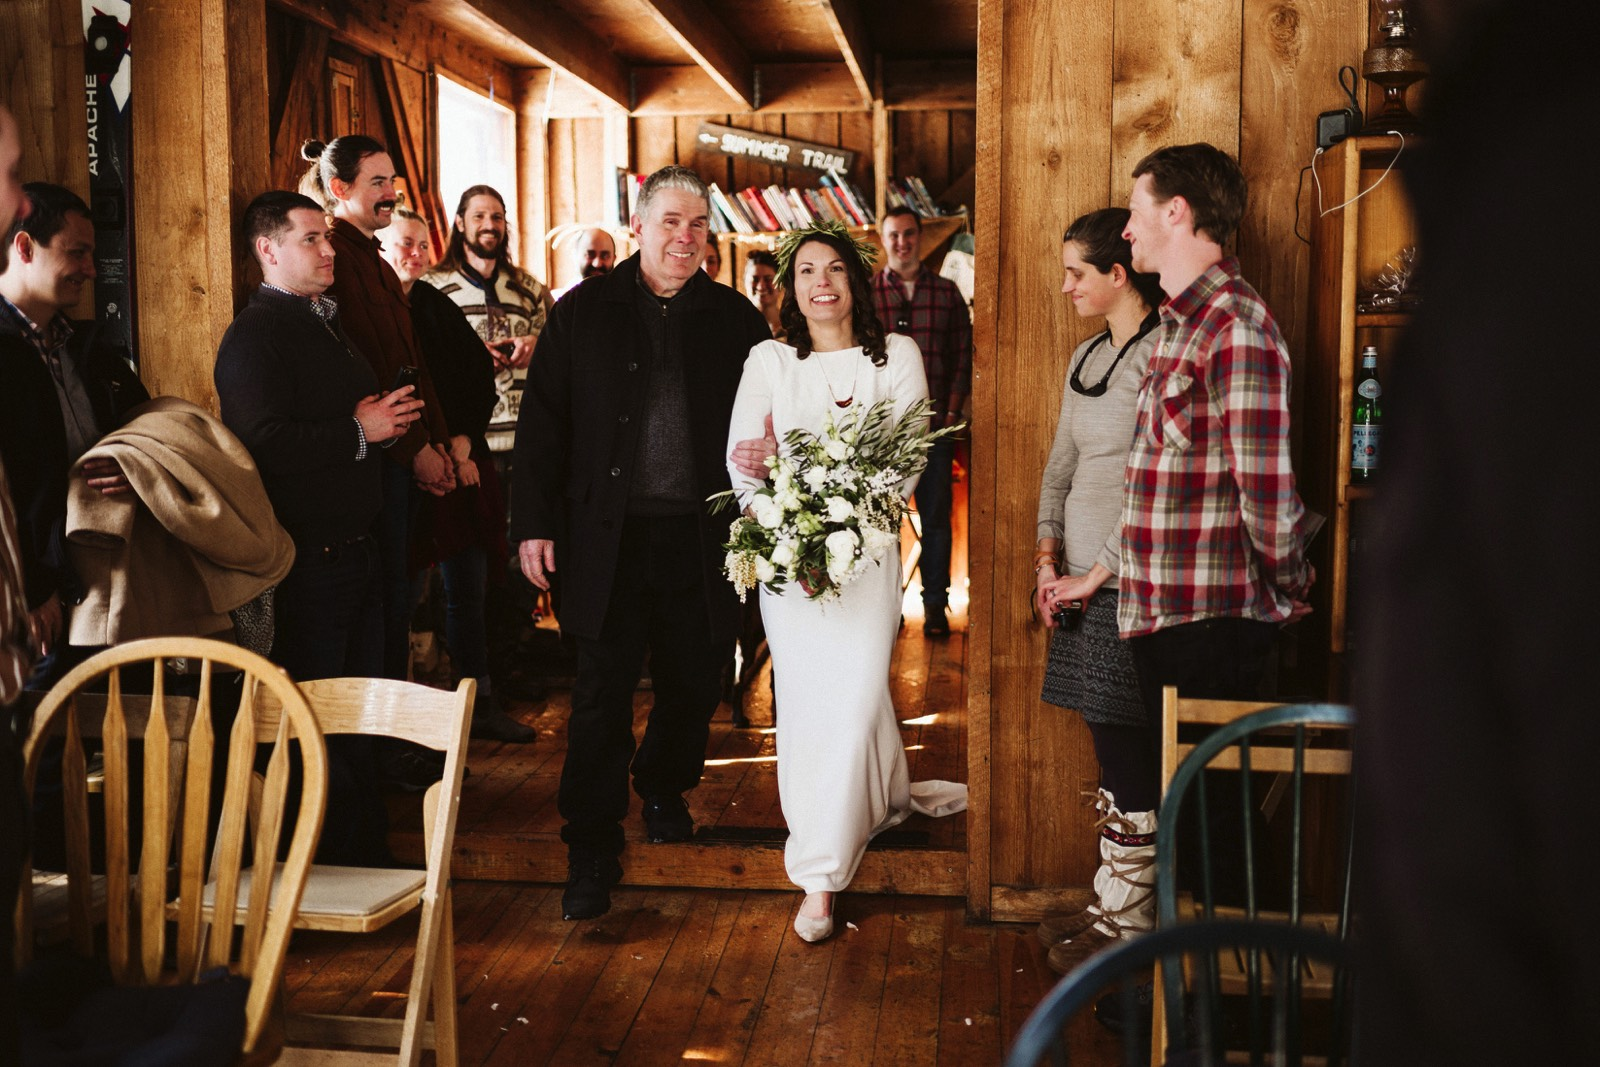 alpine-lakes-high-camp-winter-wedding-27 ALPINE LAKES HIGH CAMP WEDDING